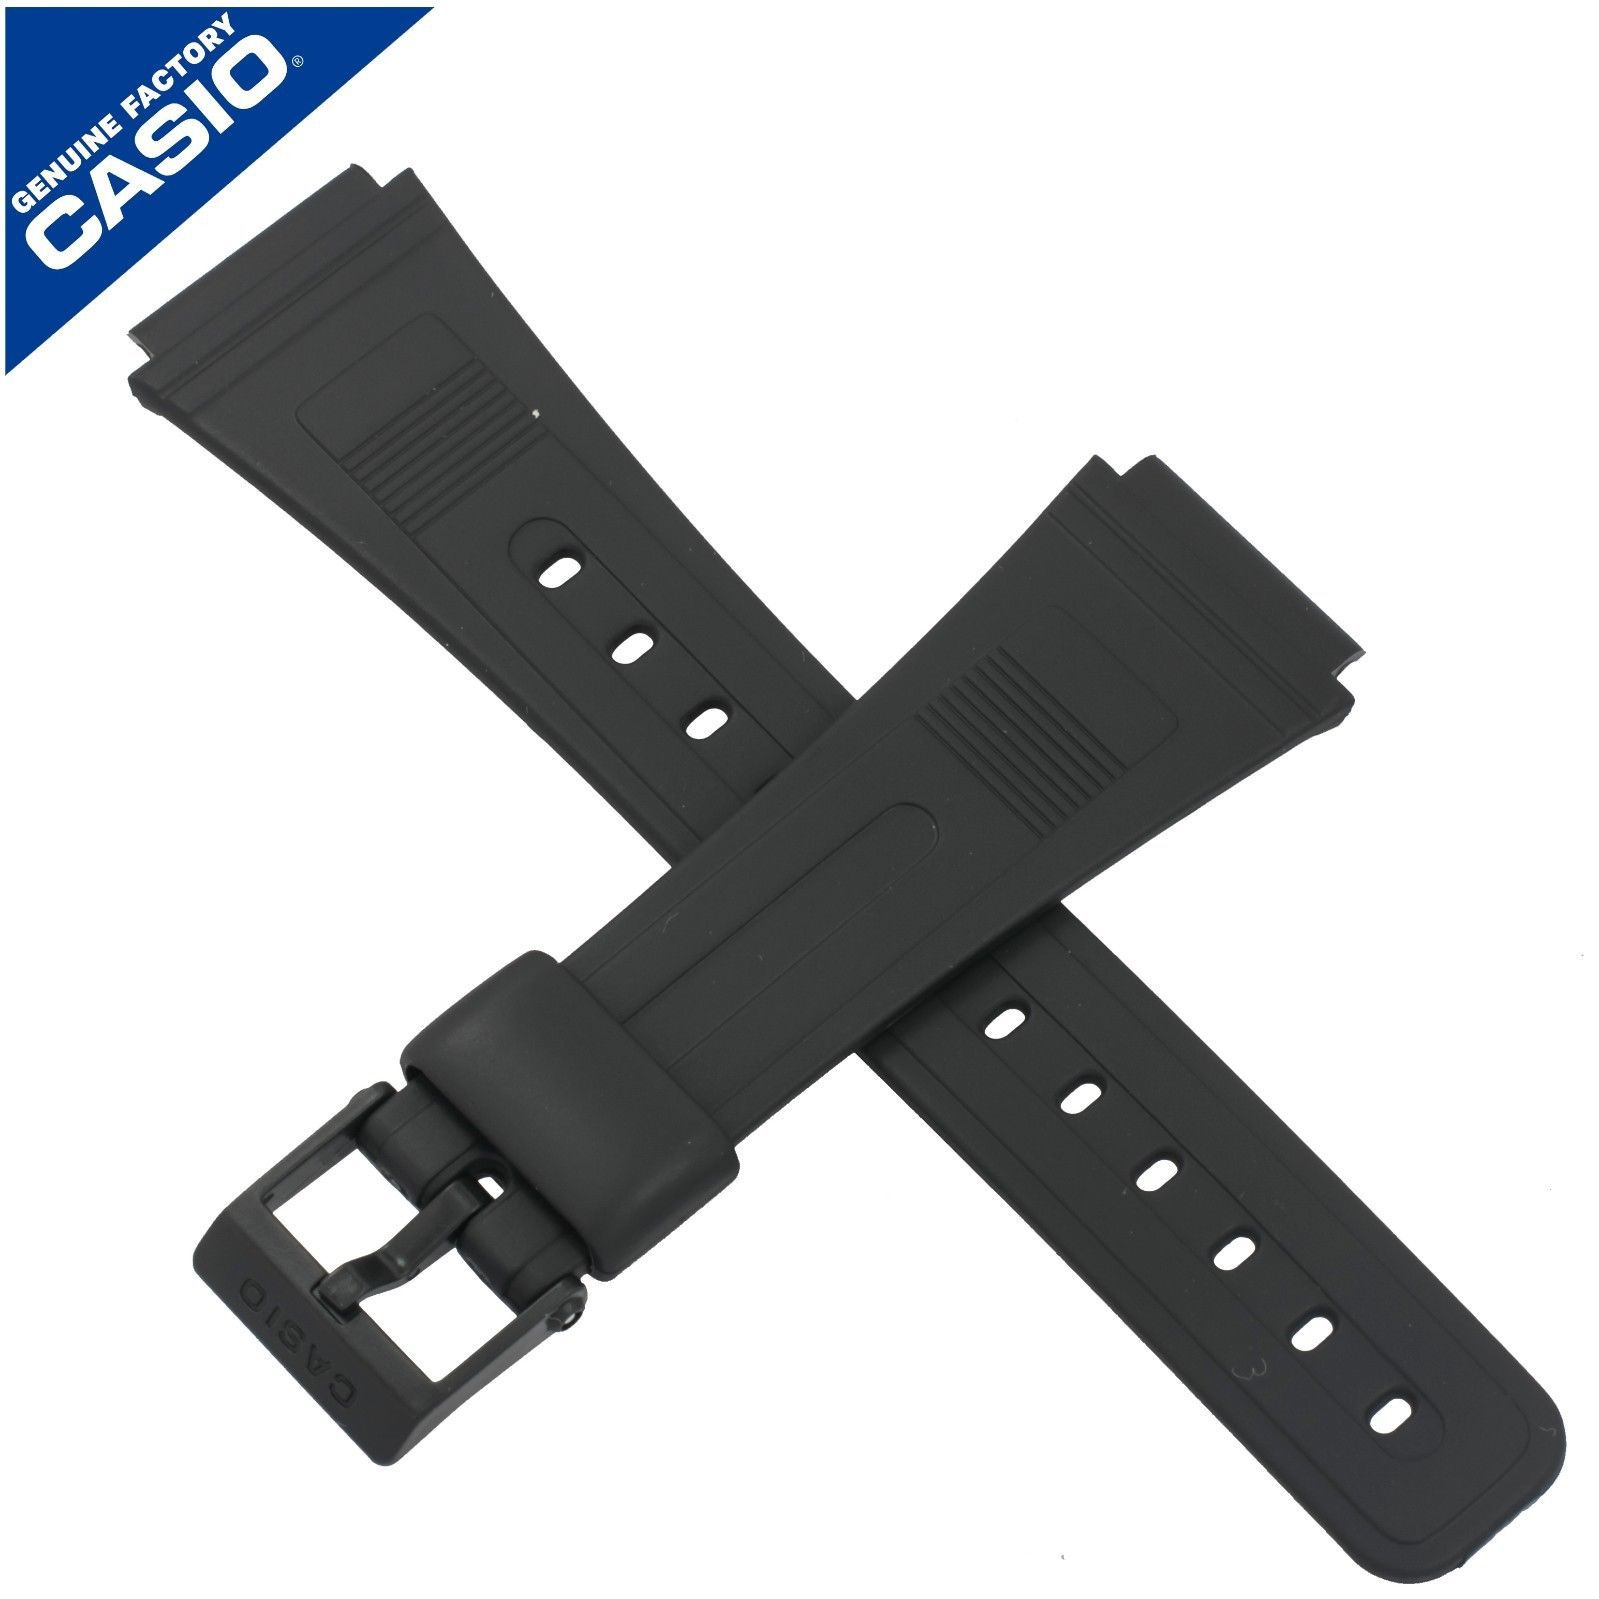 Pulseira Casio 100% Original AQ-45 AQ-46 DB-30 DB-31 DB-53 DB-55 DBA-80 DBP-25 FB-52W W-50U W-73 E W-86  - E-Presentes